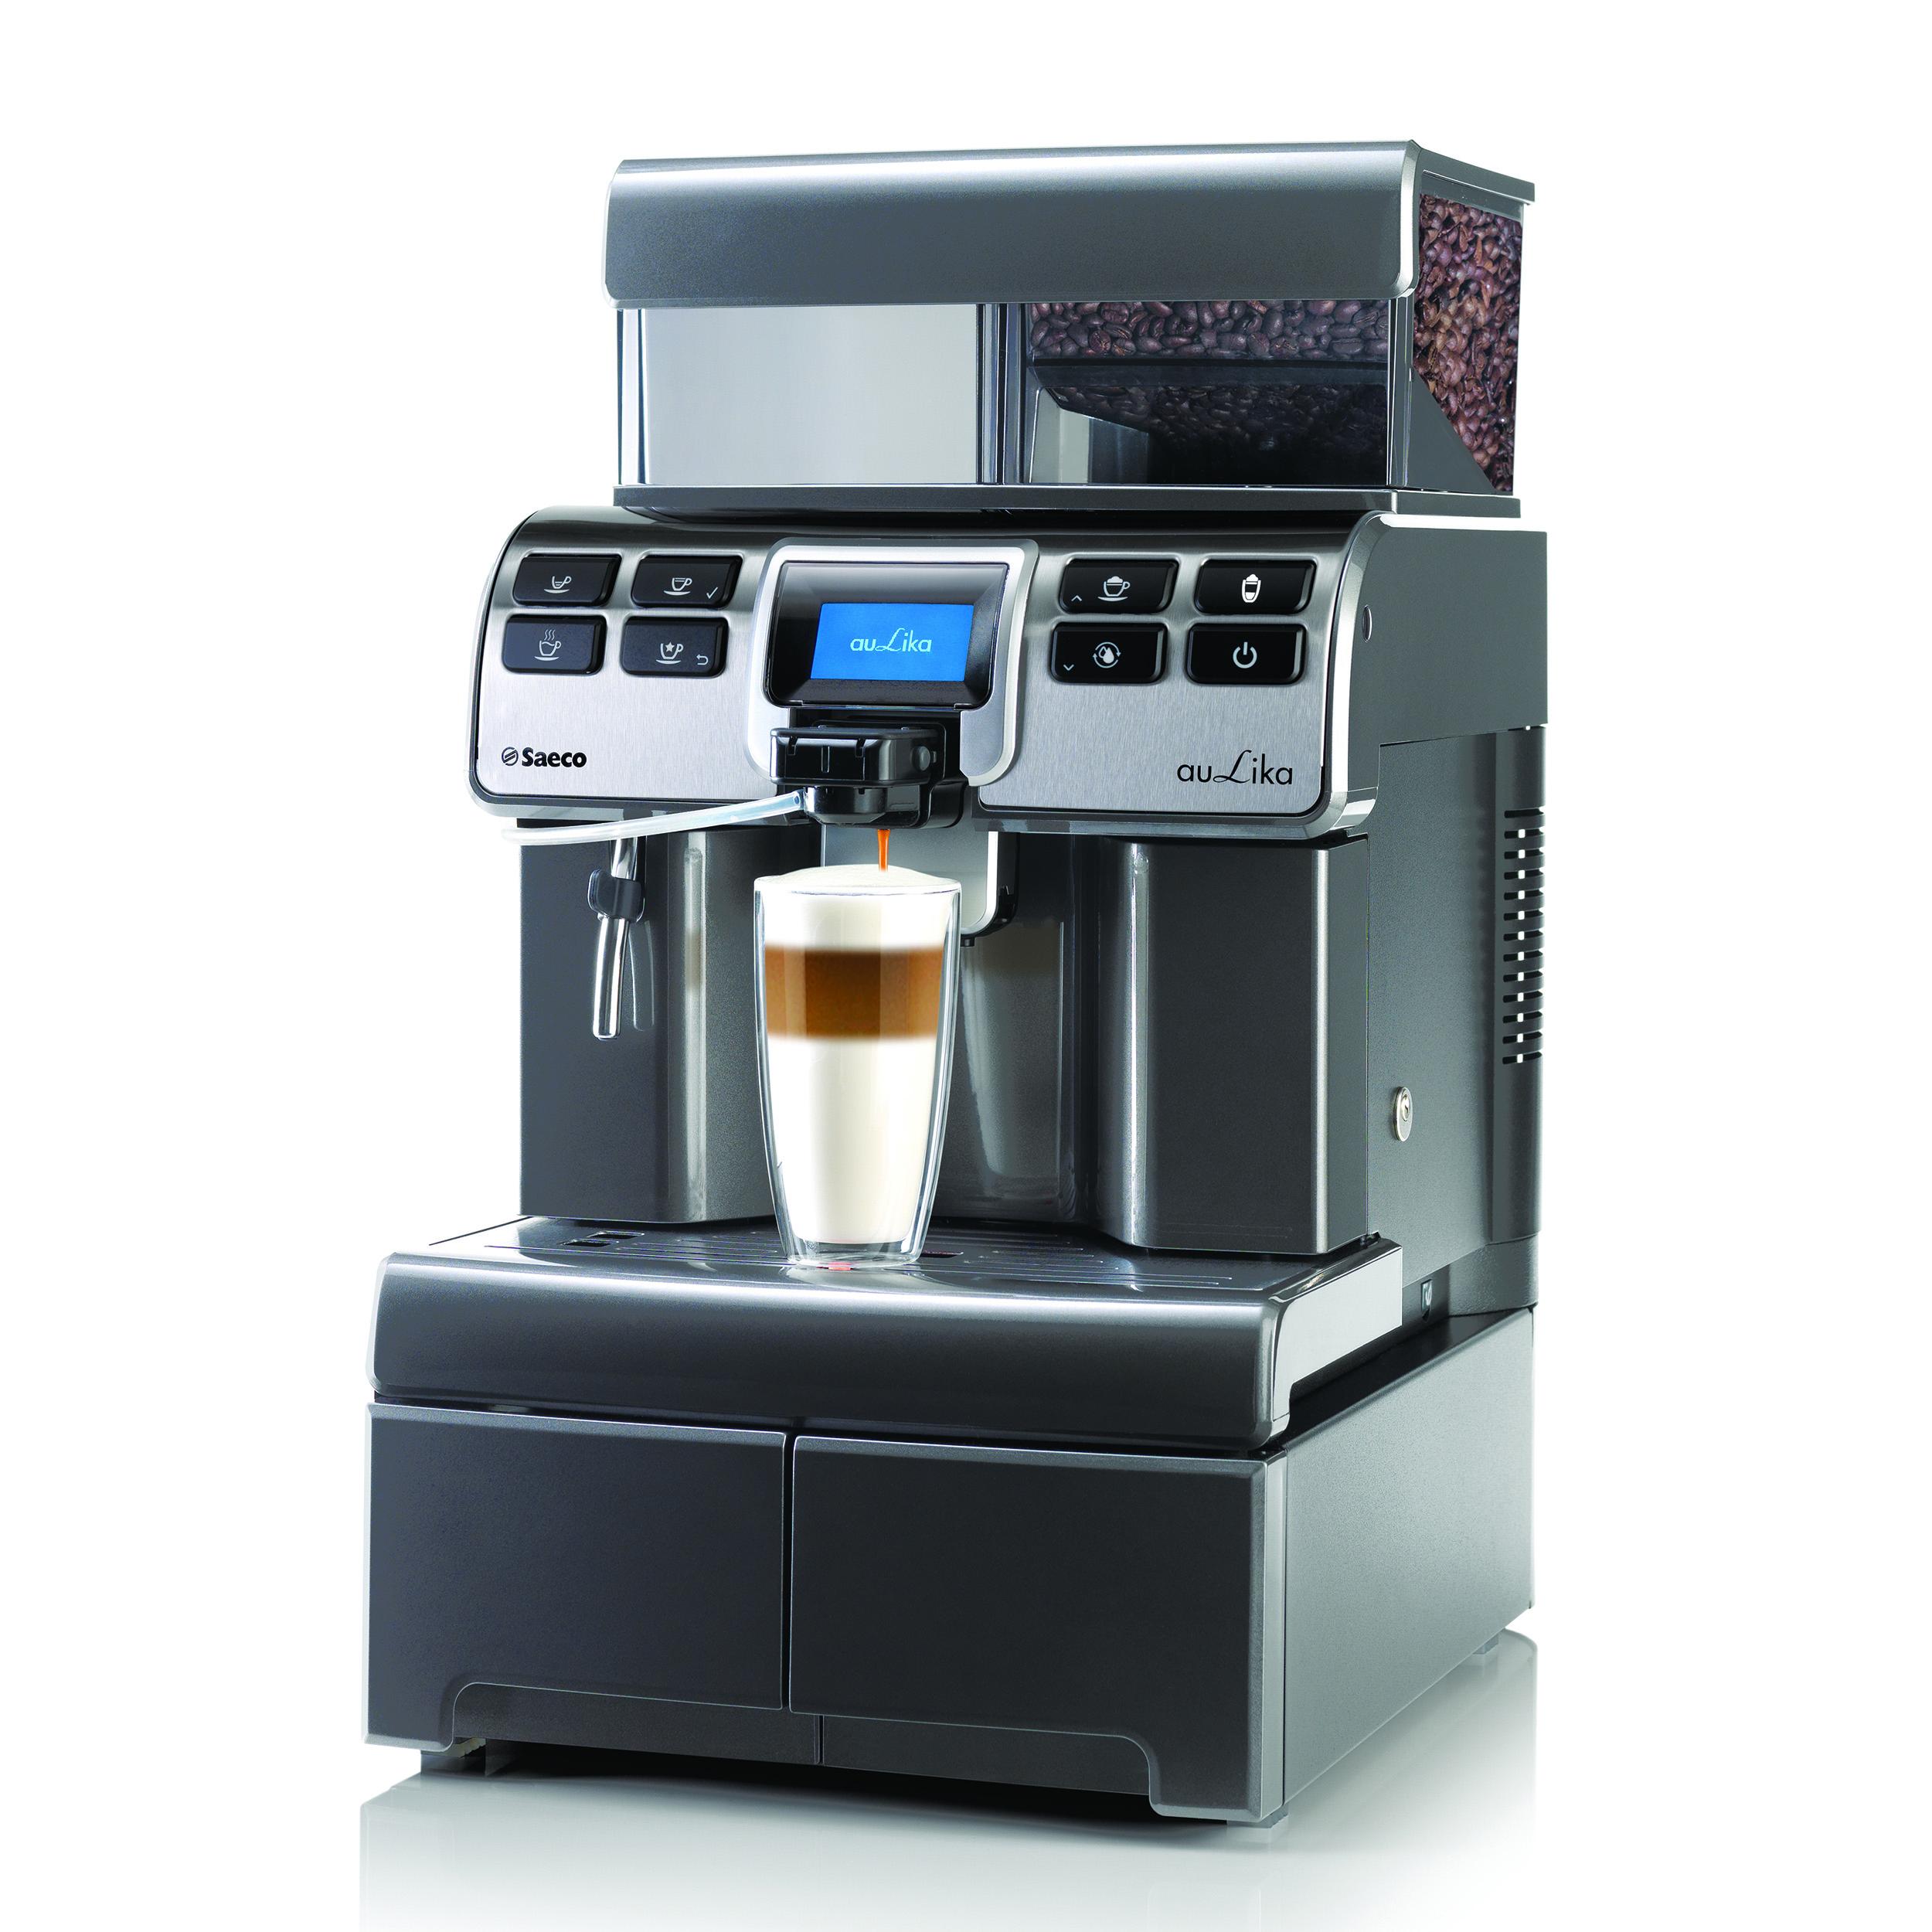 Saeco Proline Aulika V2 Top HTC One Touch Espresso Machine